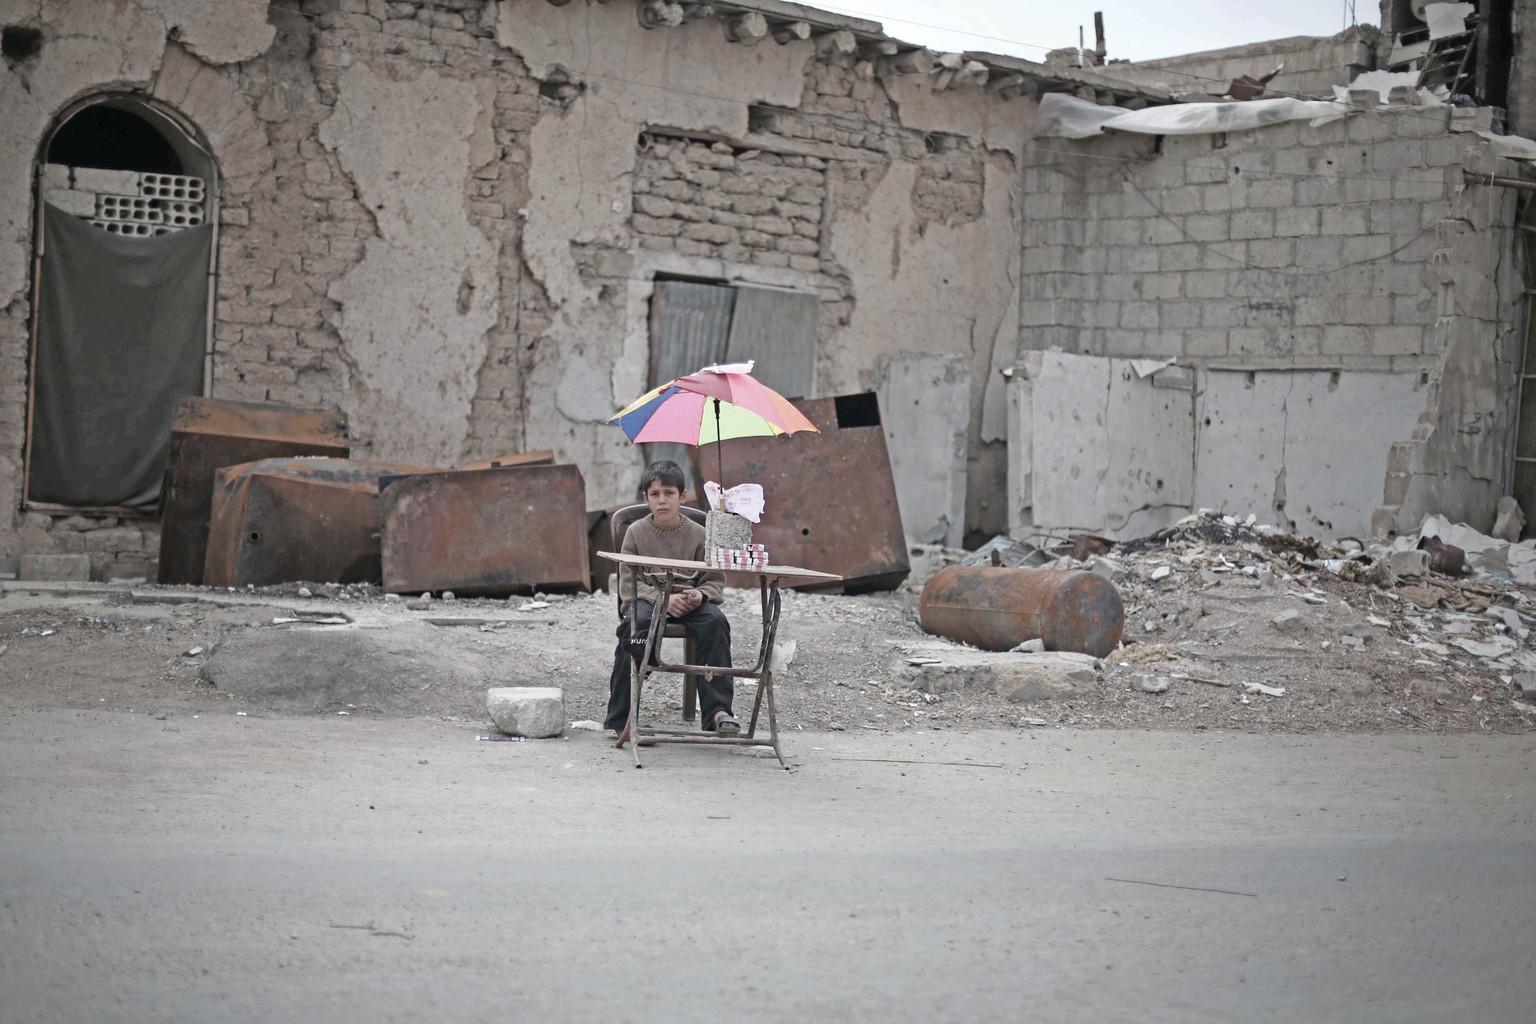 © UNICEF/UN013167/Al Shami